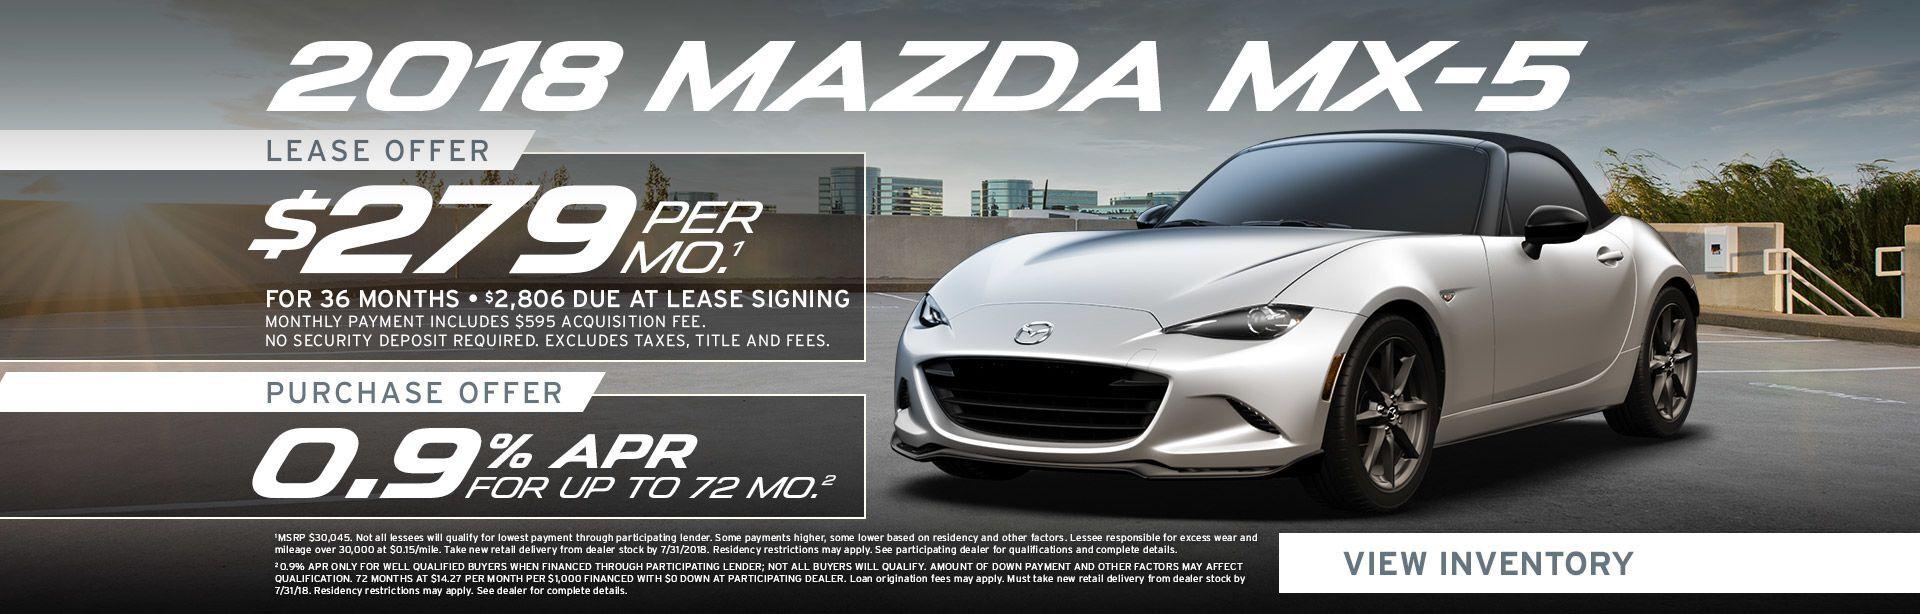 Mazda MX-5 Miata Specials